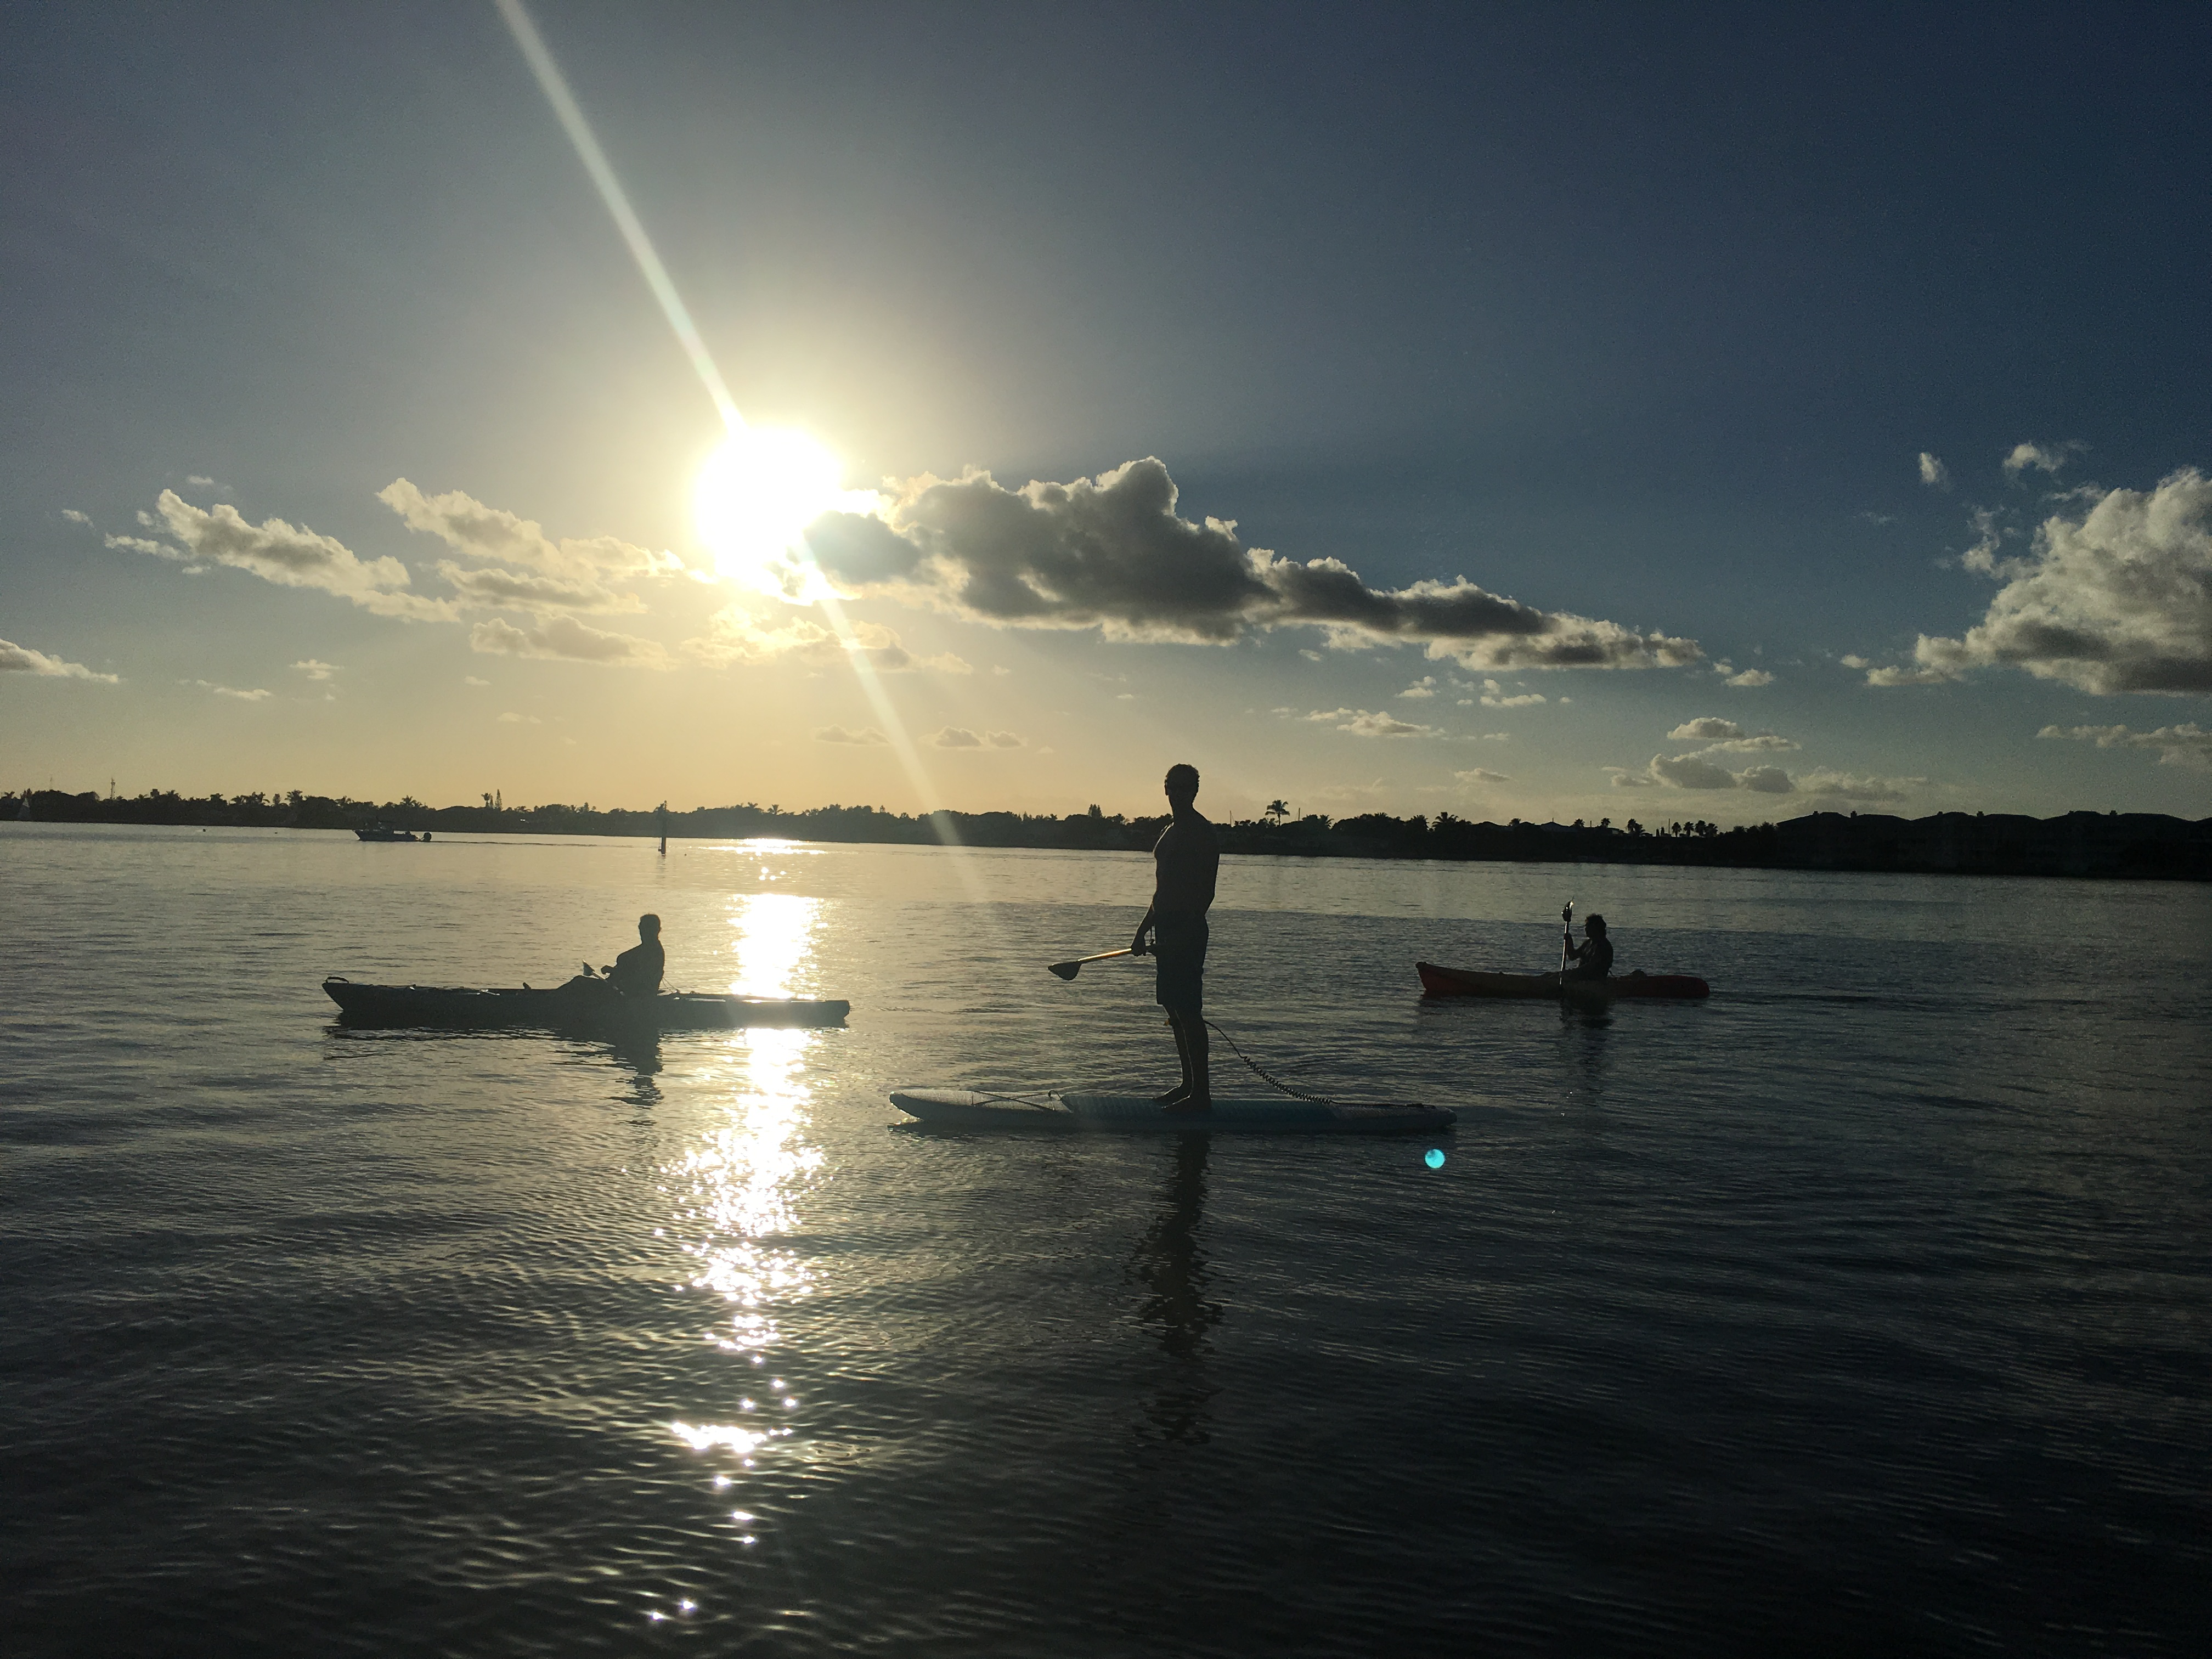 Sunset Paddle Board And Kayak Tour